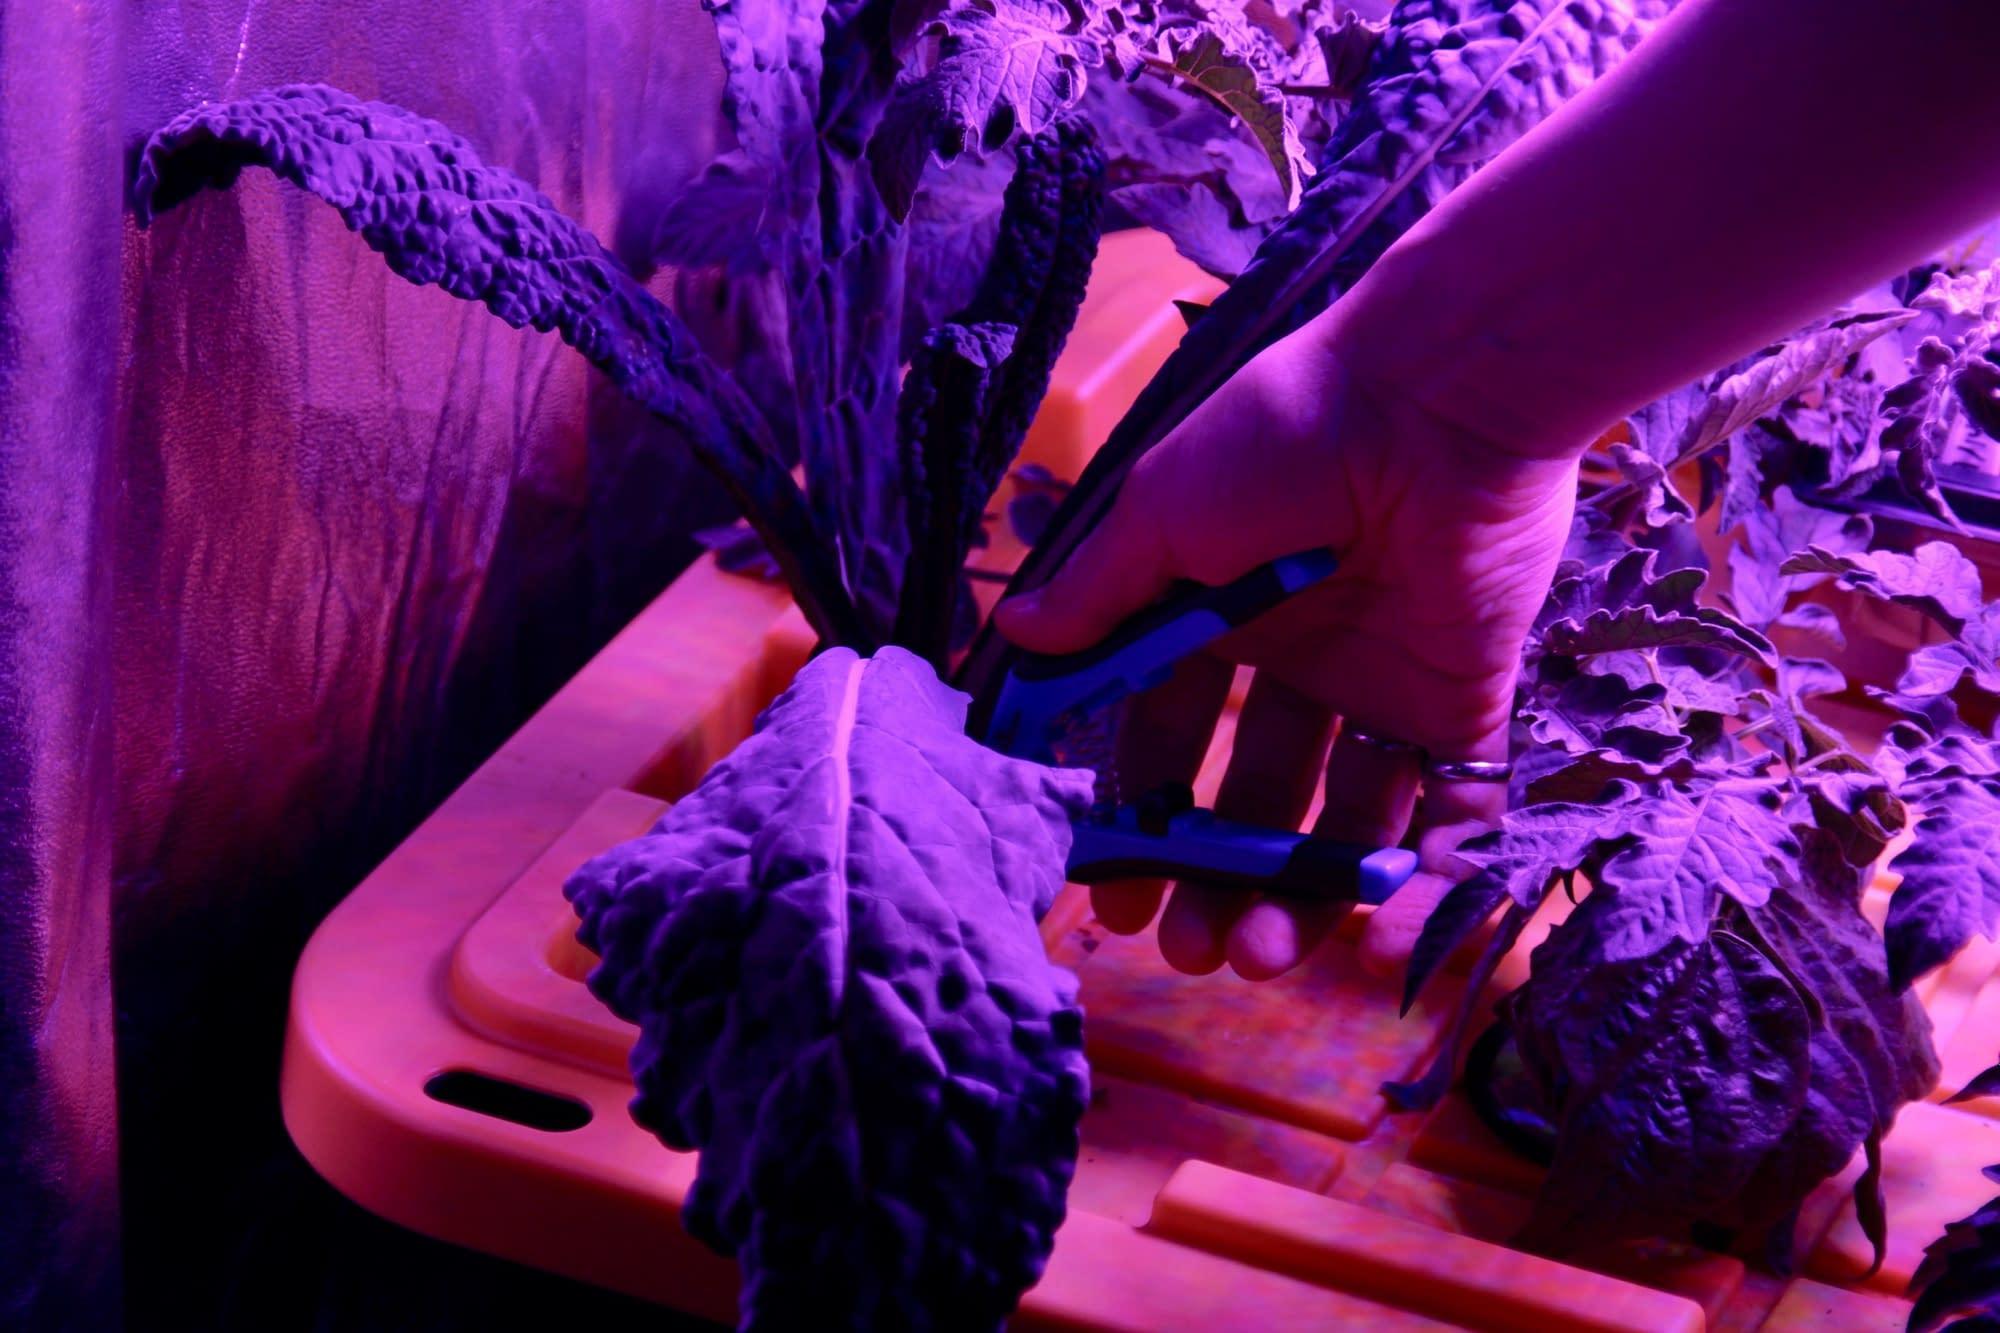 Kale growing in the aeroponic garden.